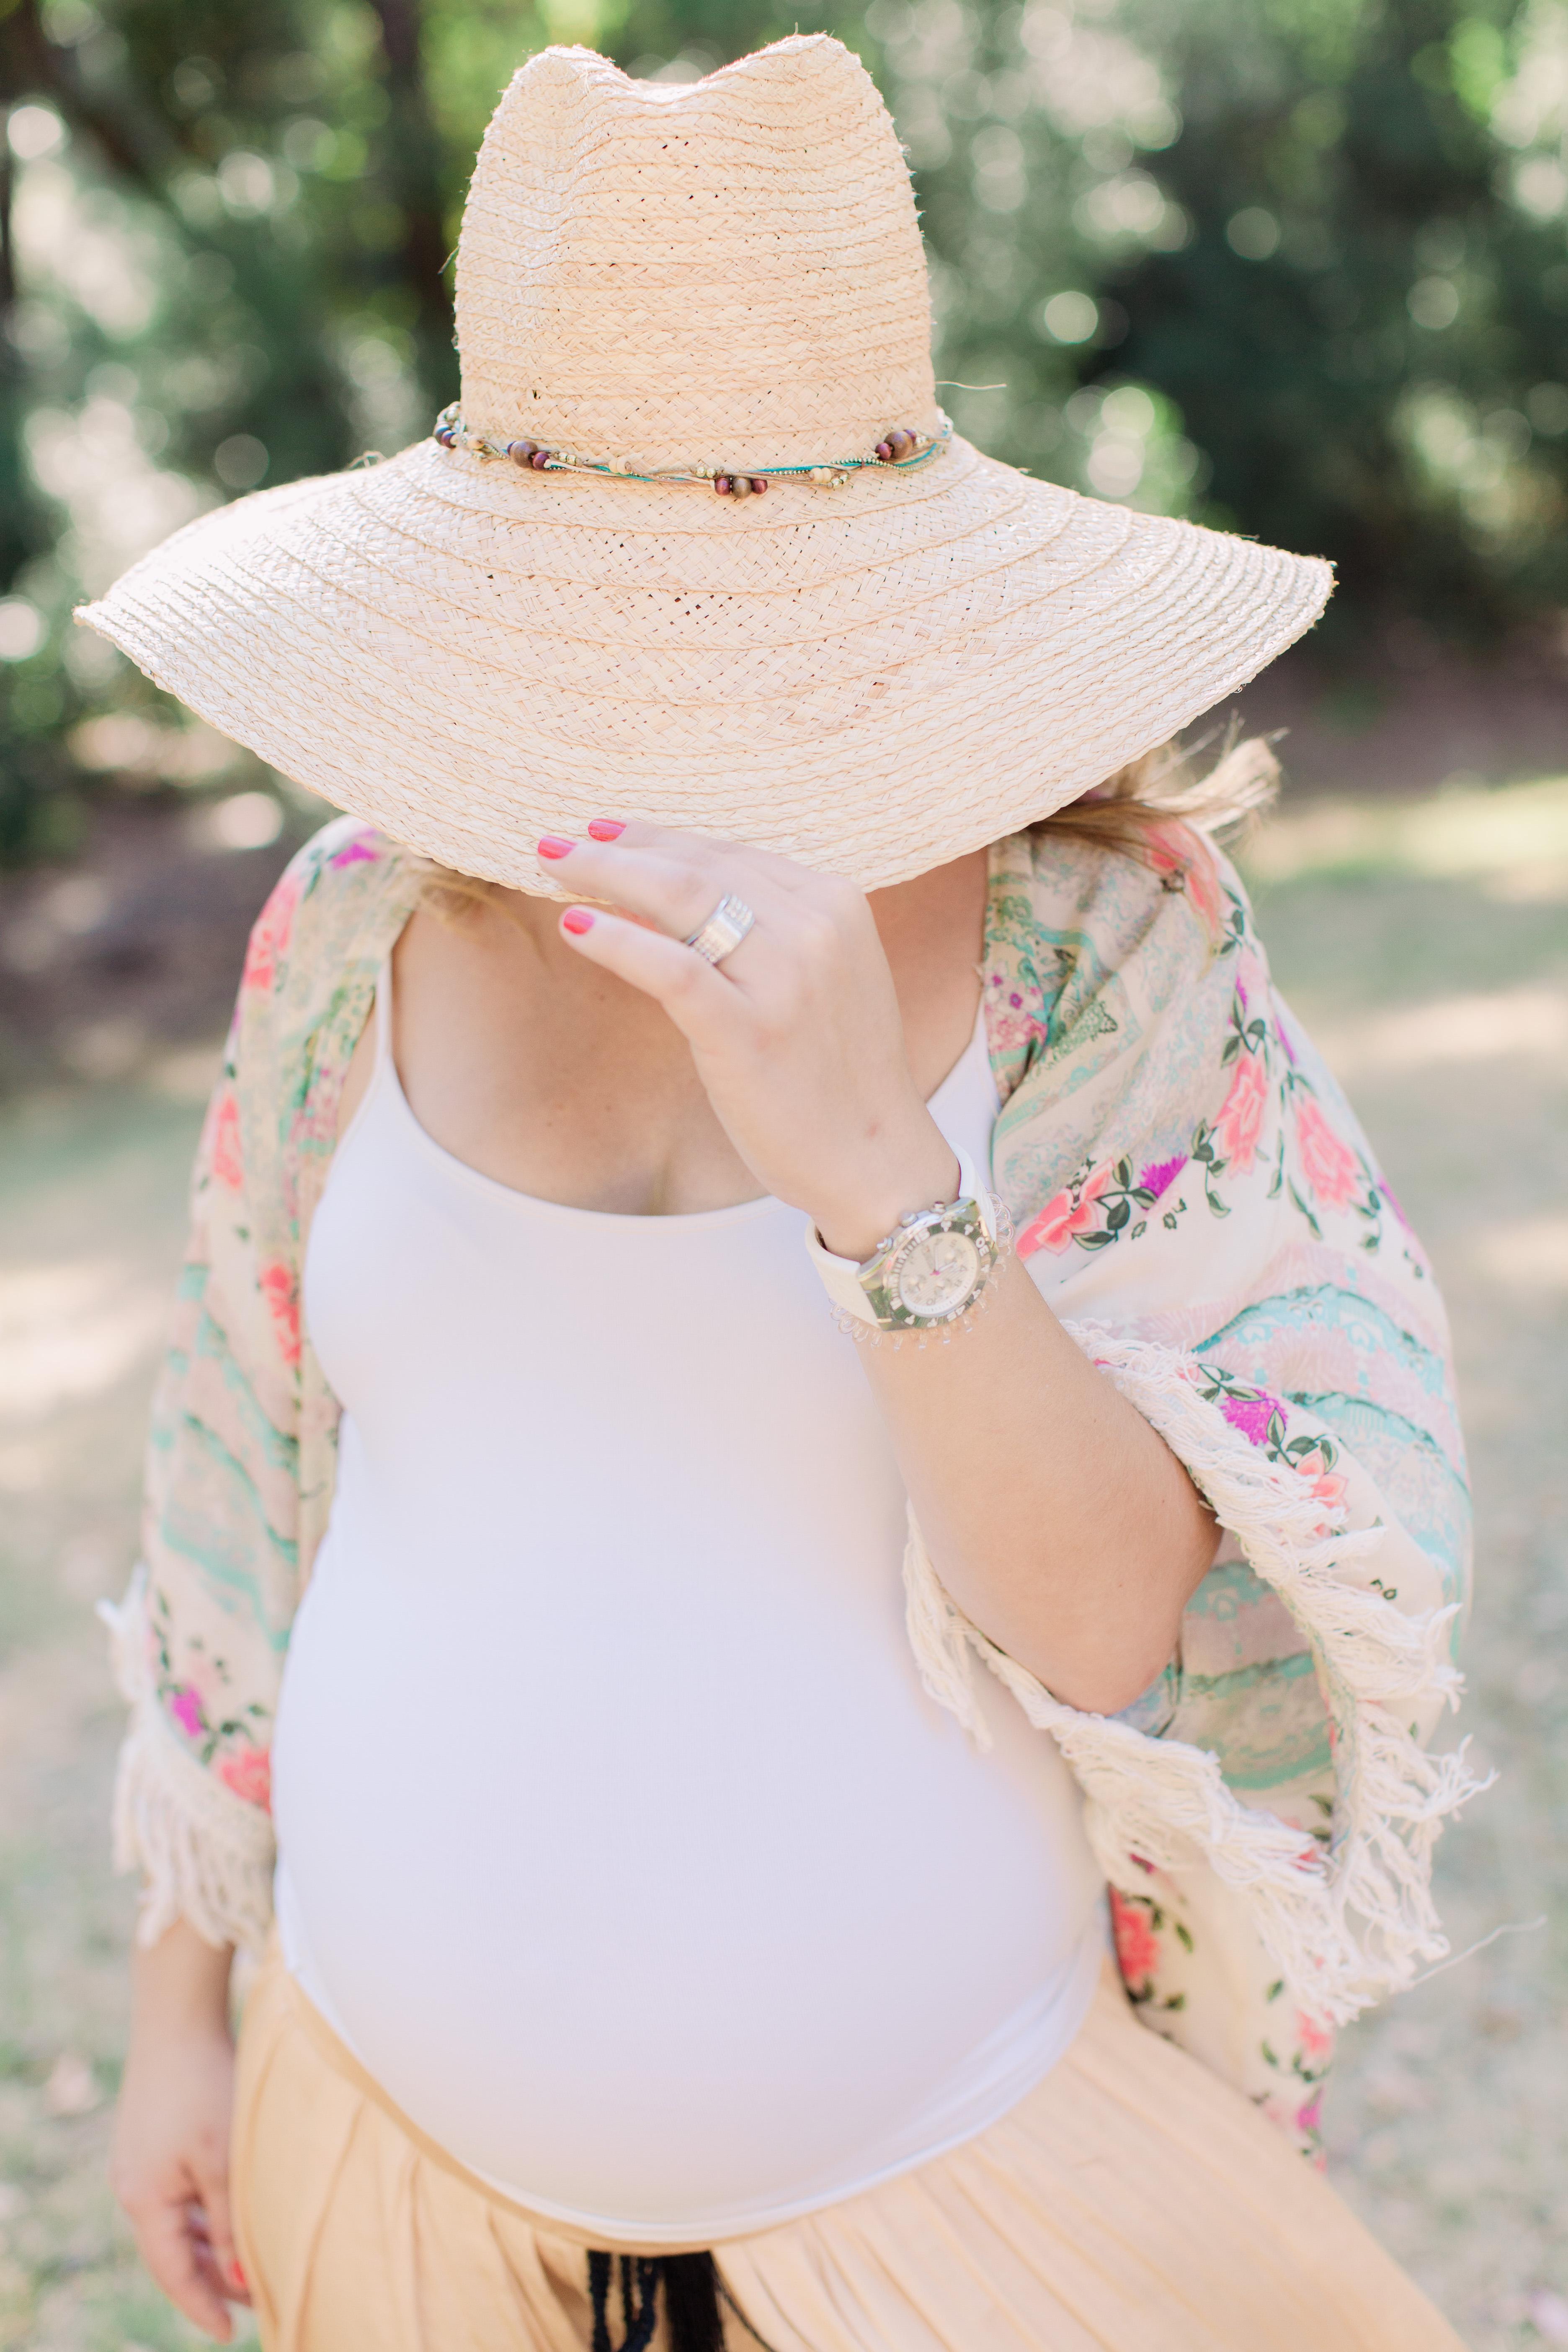 Maternity_SofiaMariaHugo_068